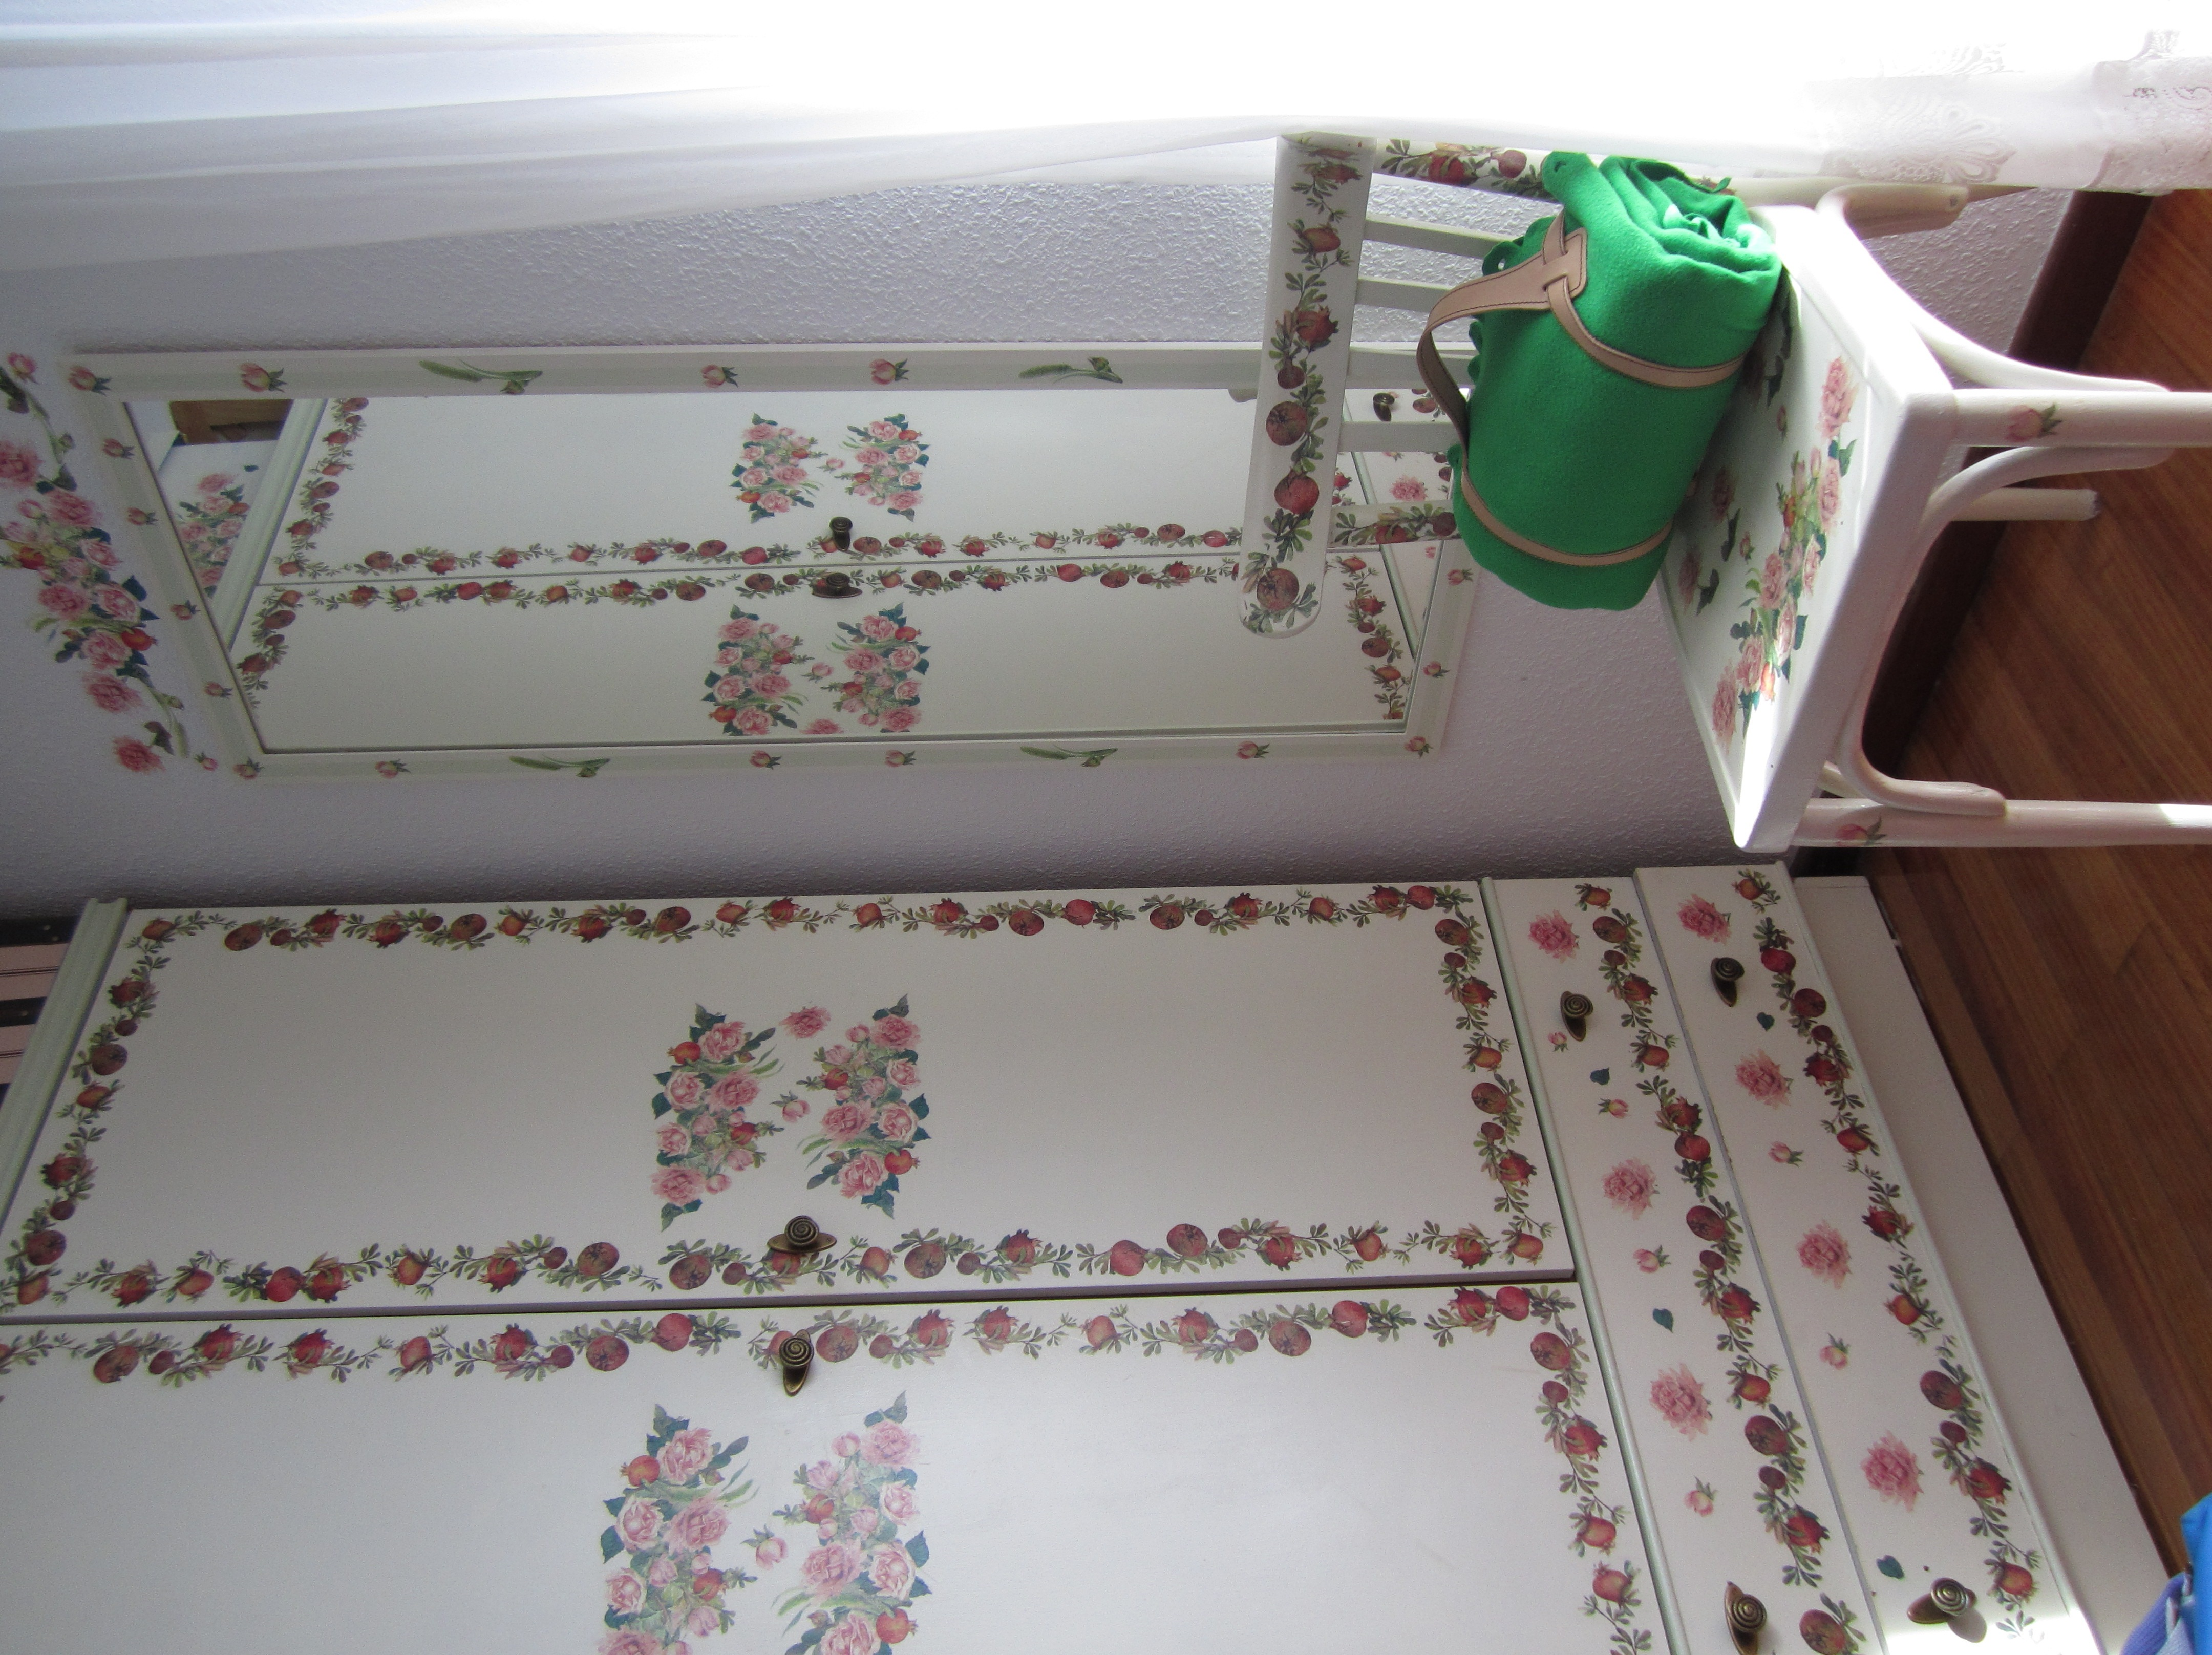 Muebles Nos Lo Pasamos Divinamente P Gina 7 # Muebles Cadena Flores